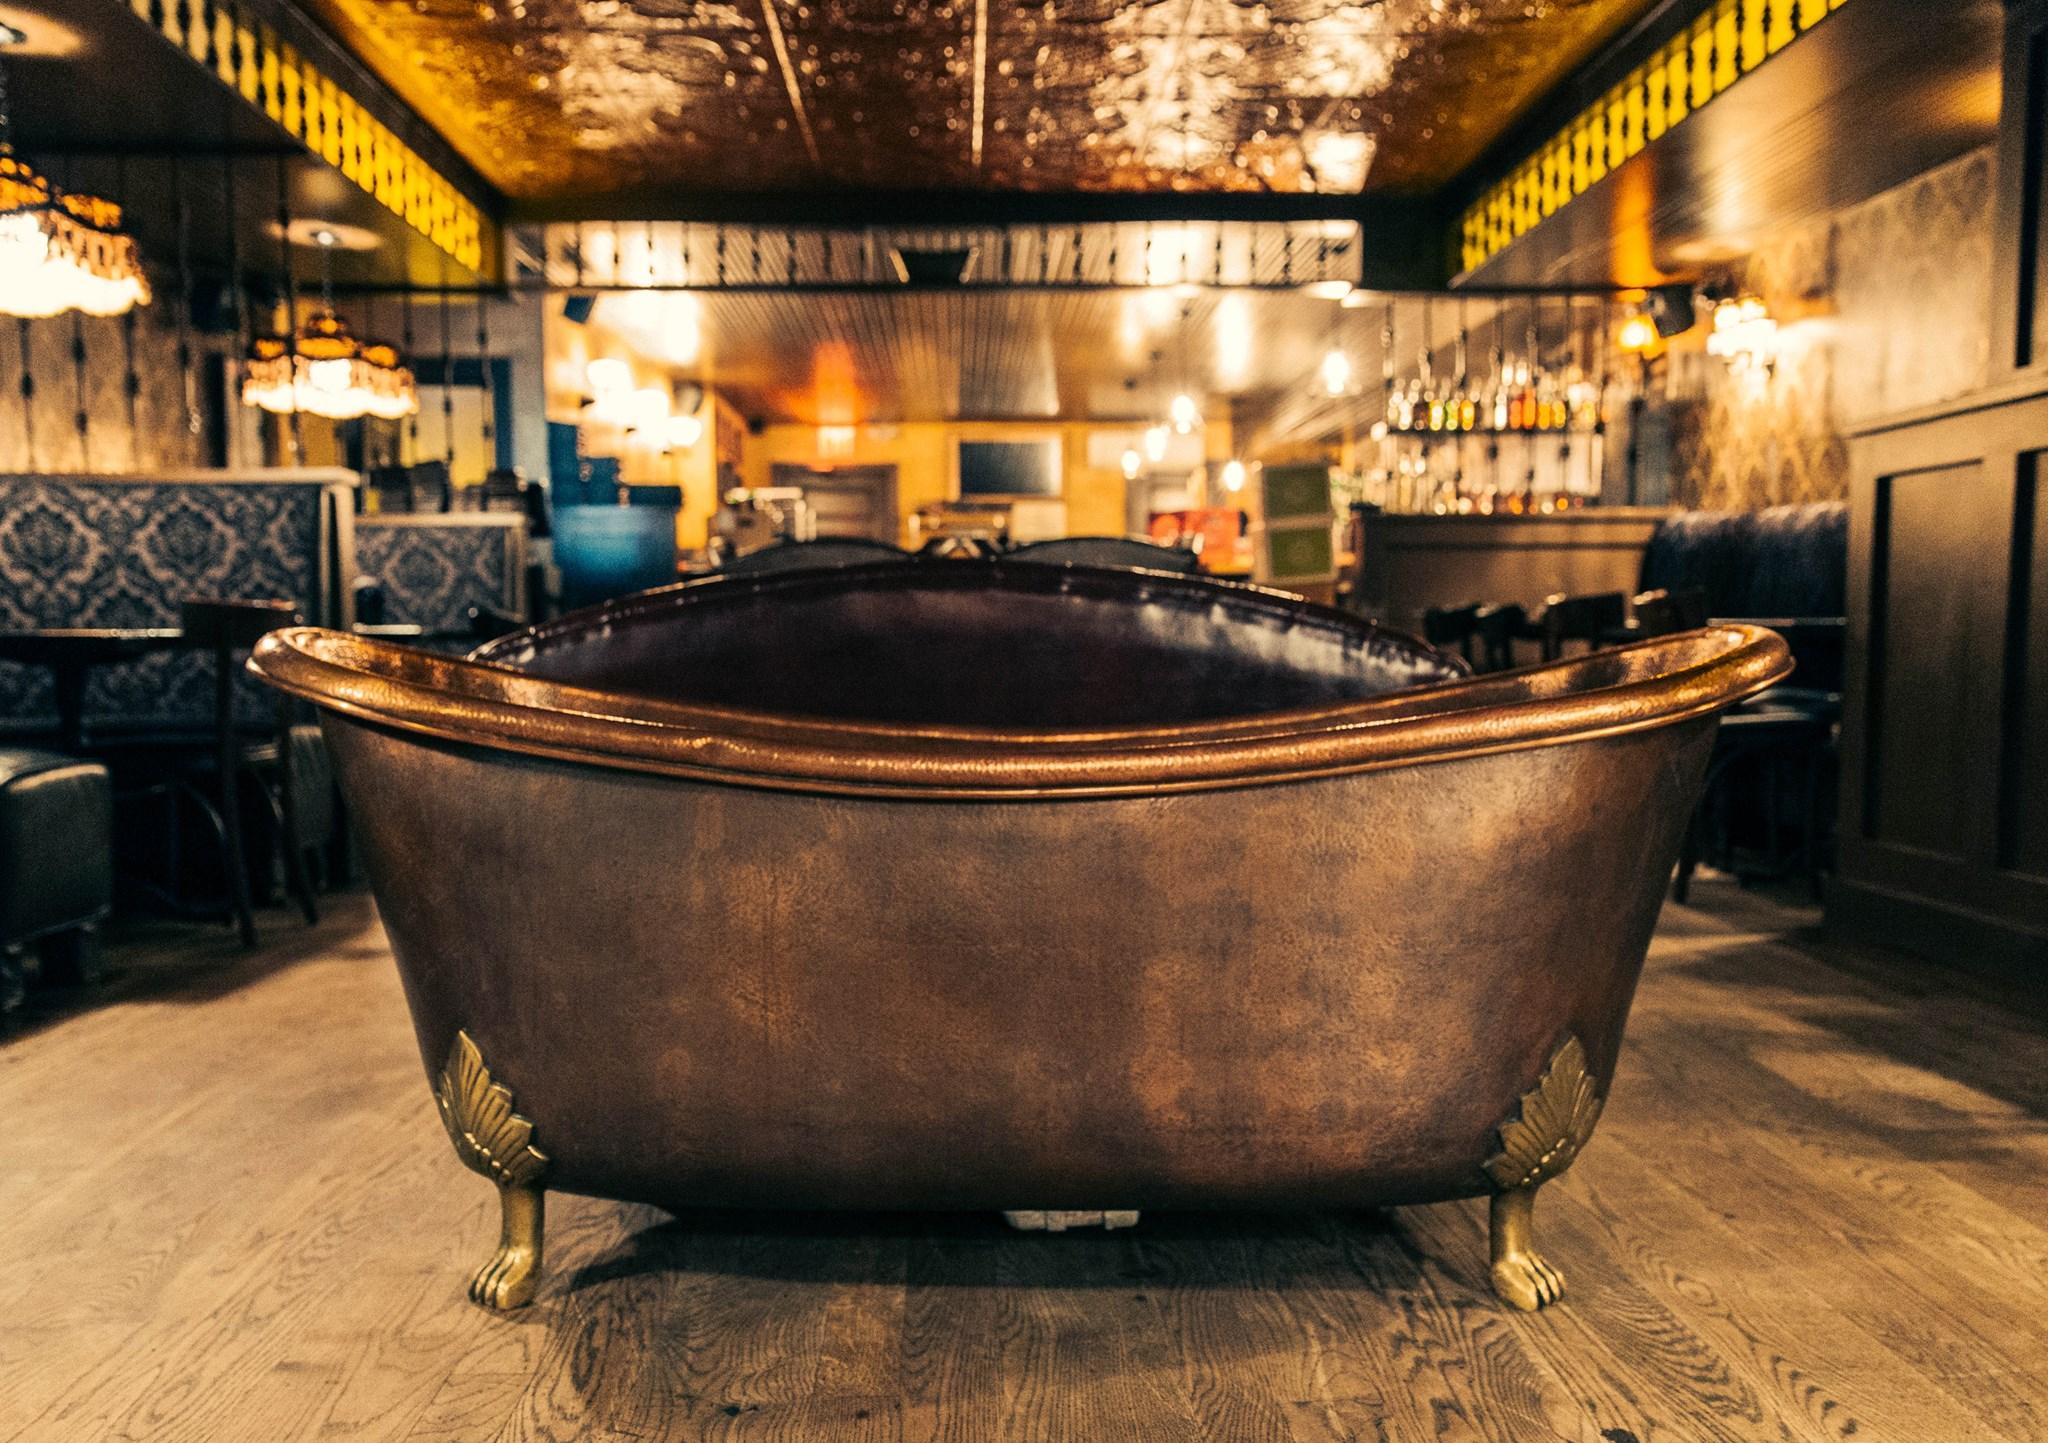 BATHUB GIN - LA MILAGROSA AGAVE BAR & LISTENING ROOM - THE BACK ROOM - NEW YORK